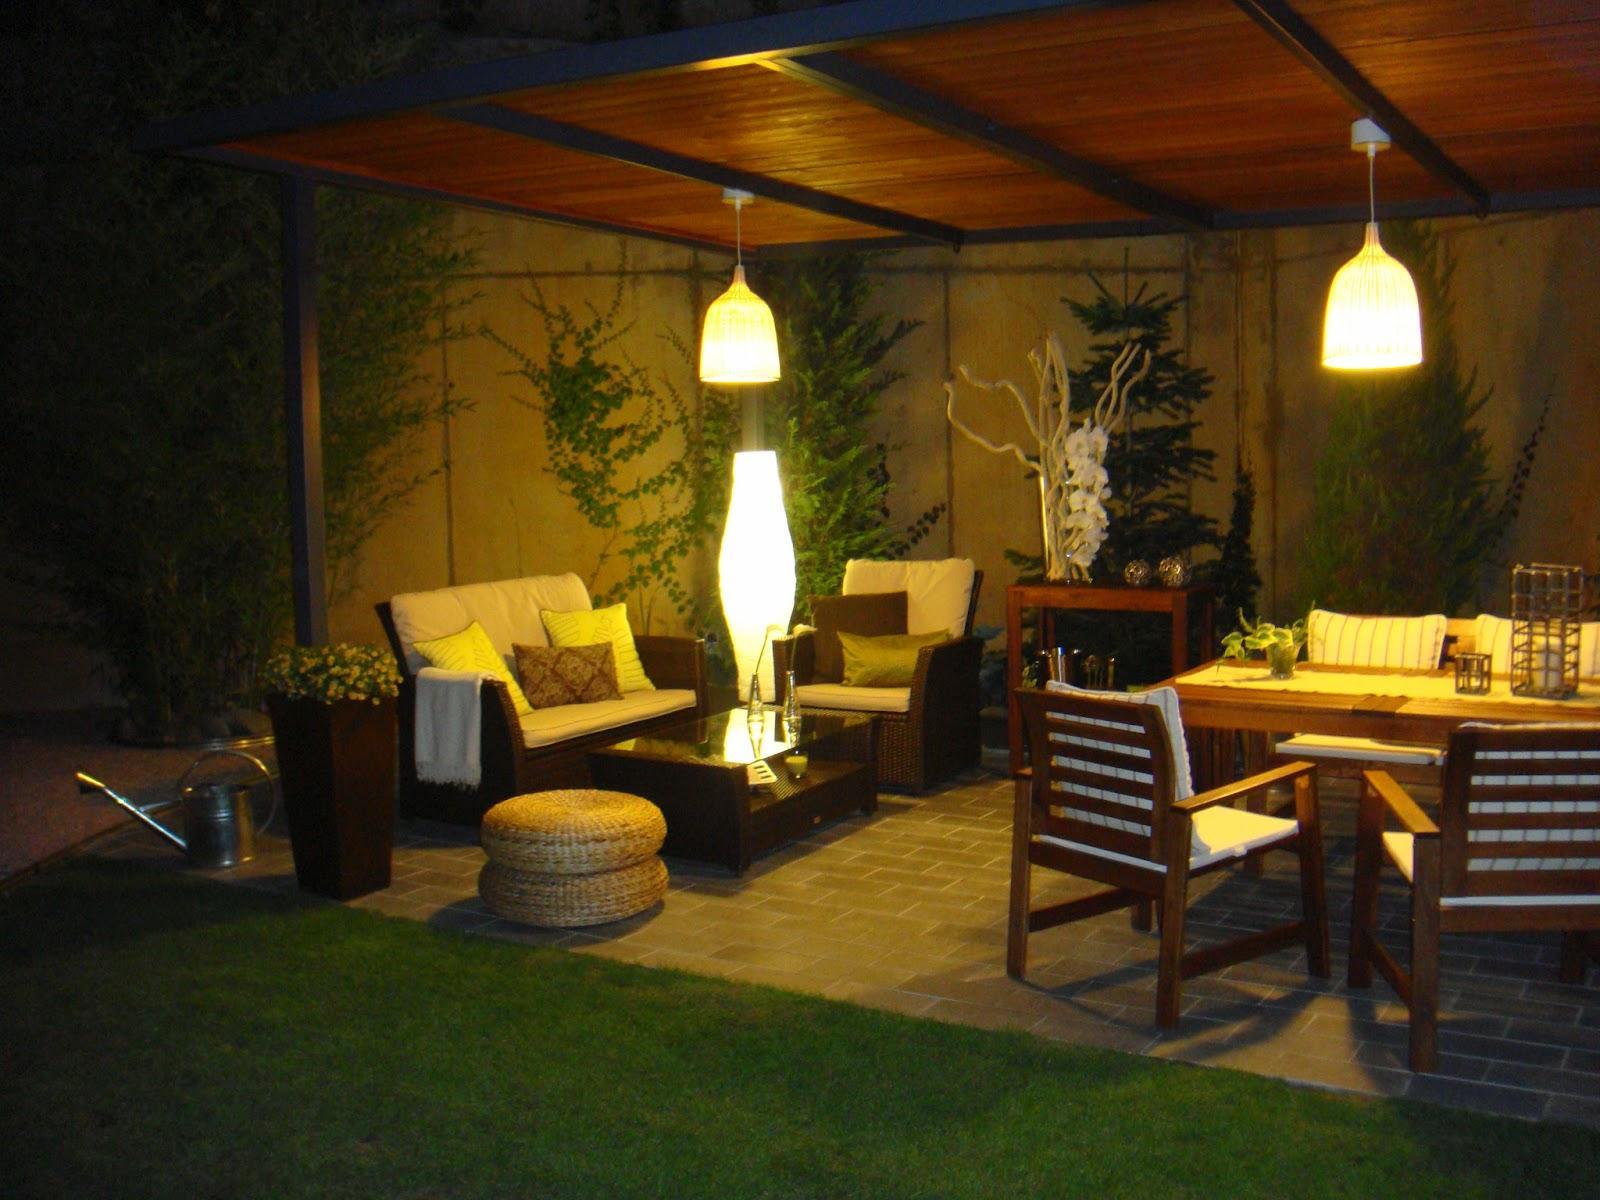 La iluminaria ideal para la terraza Iluminacion de terrazas exteriores